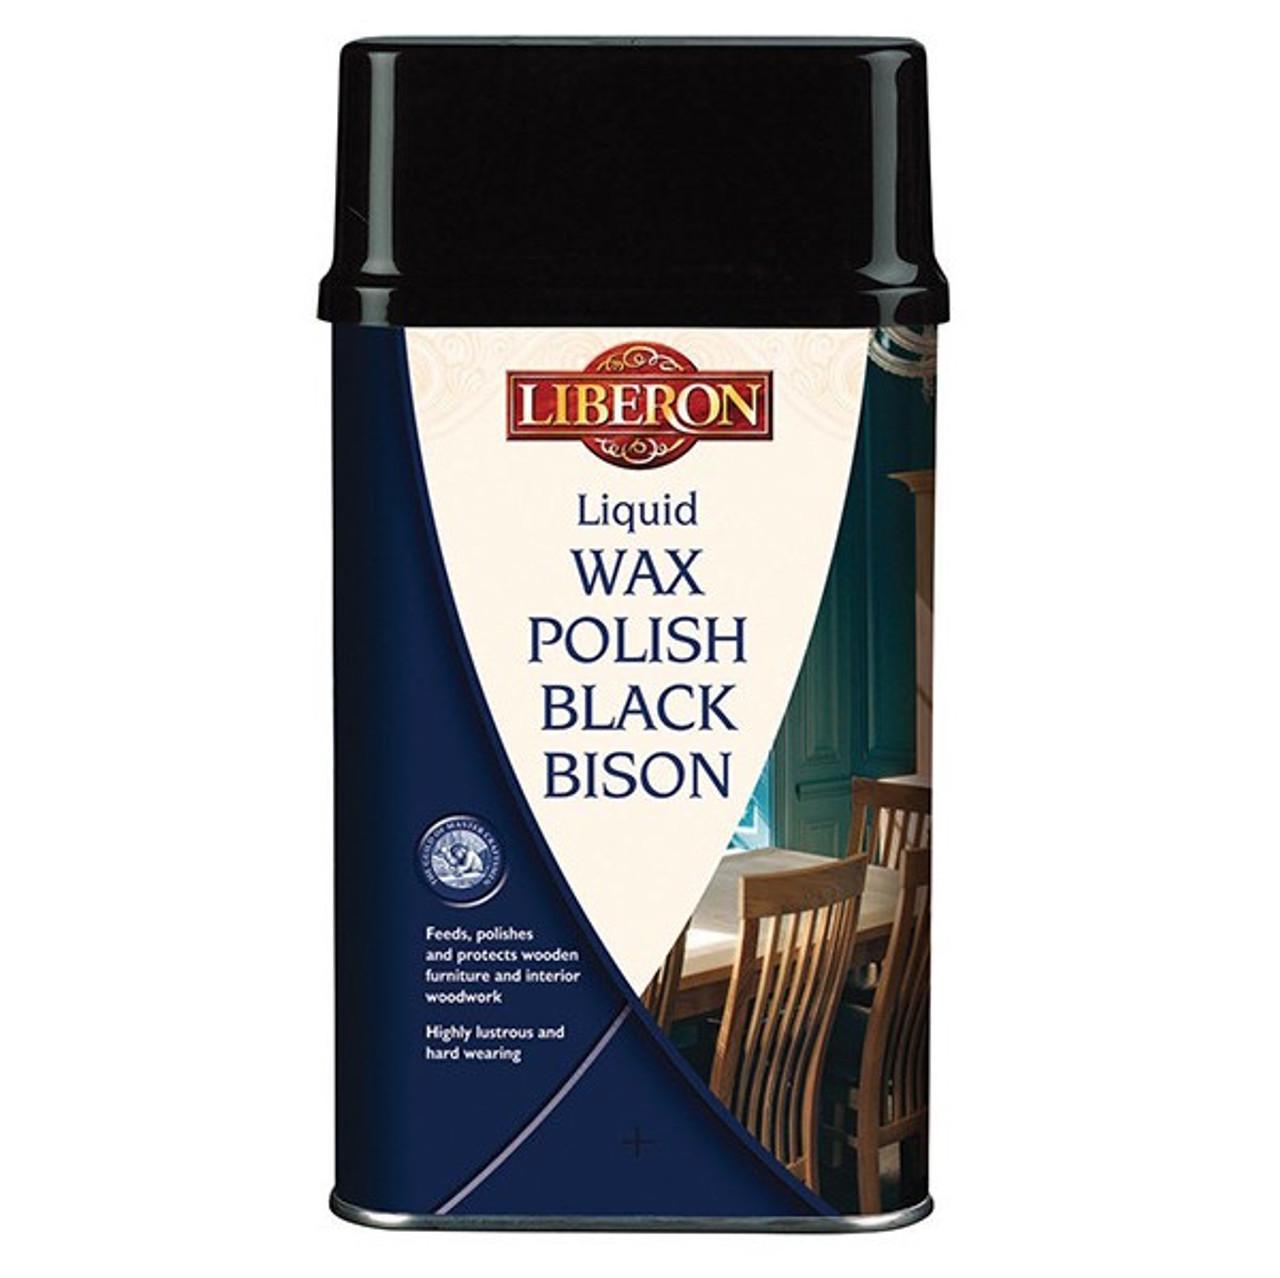 Liberon Black Bison Liquid Wax